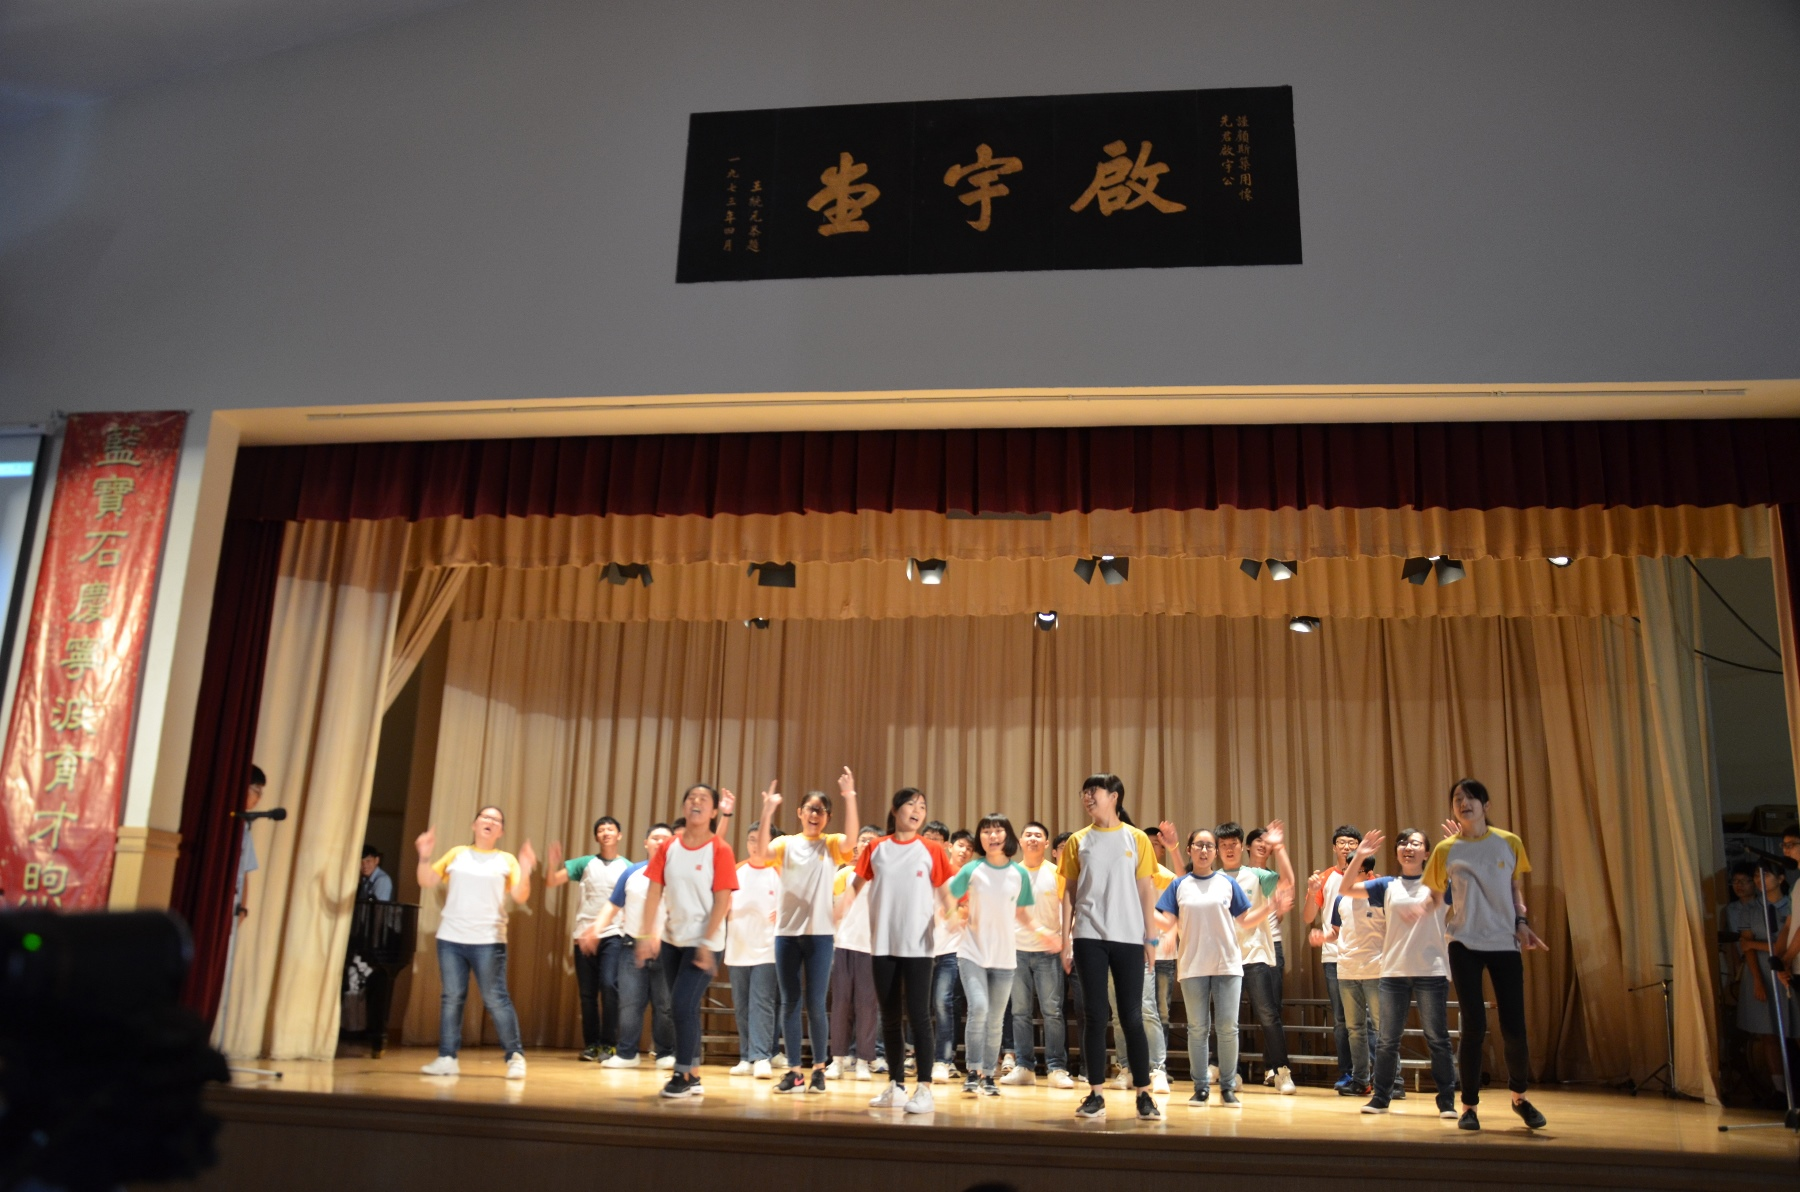 http://www.npc.edu.hk/sites/default/files/dsc_7364.jpg